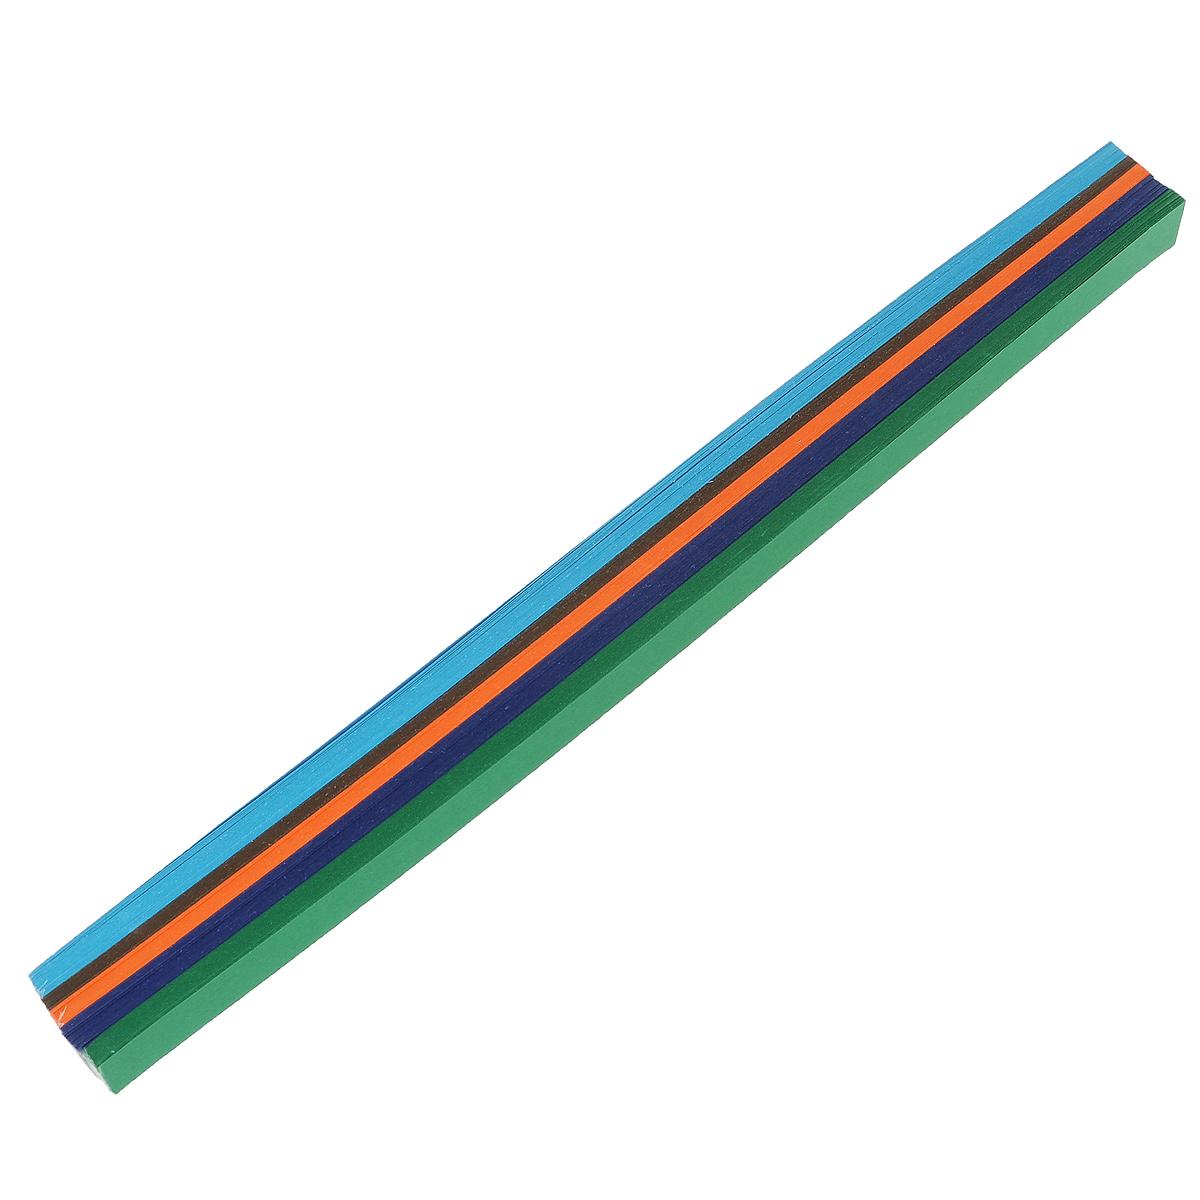 Набор бумаги для квиллинга АртНева, ширина 15 мм, 125 листов набор бумаги для квиллинга цвет ярко розовый полоски 0 3 х 30 см 100 шт